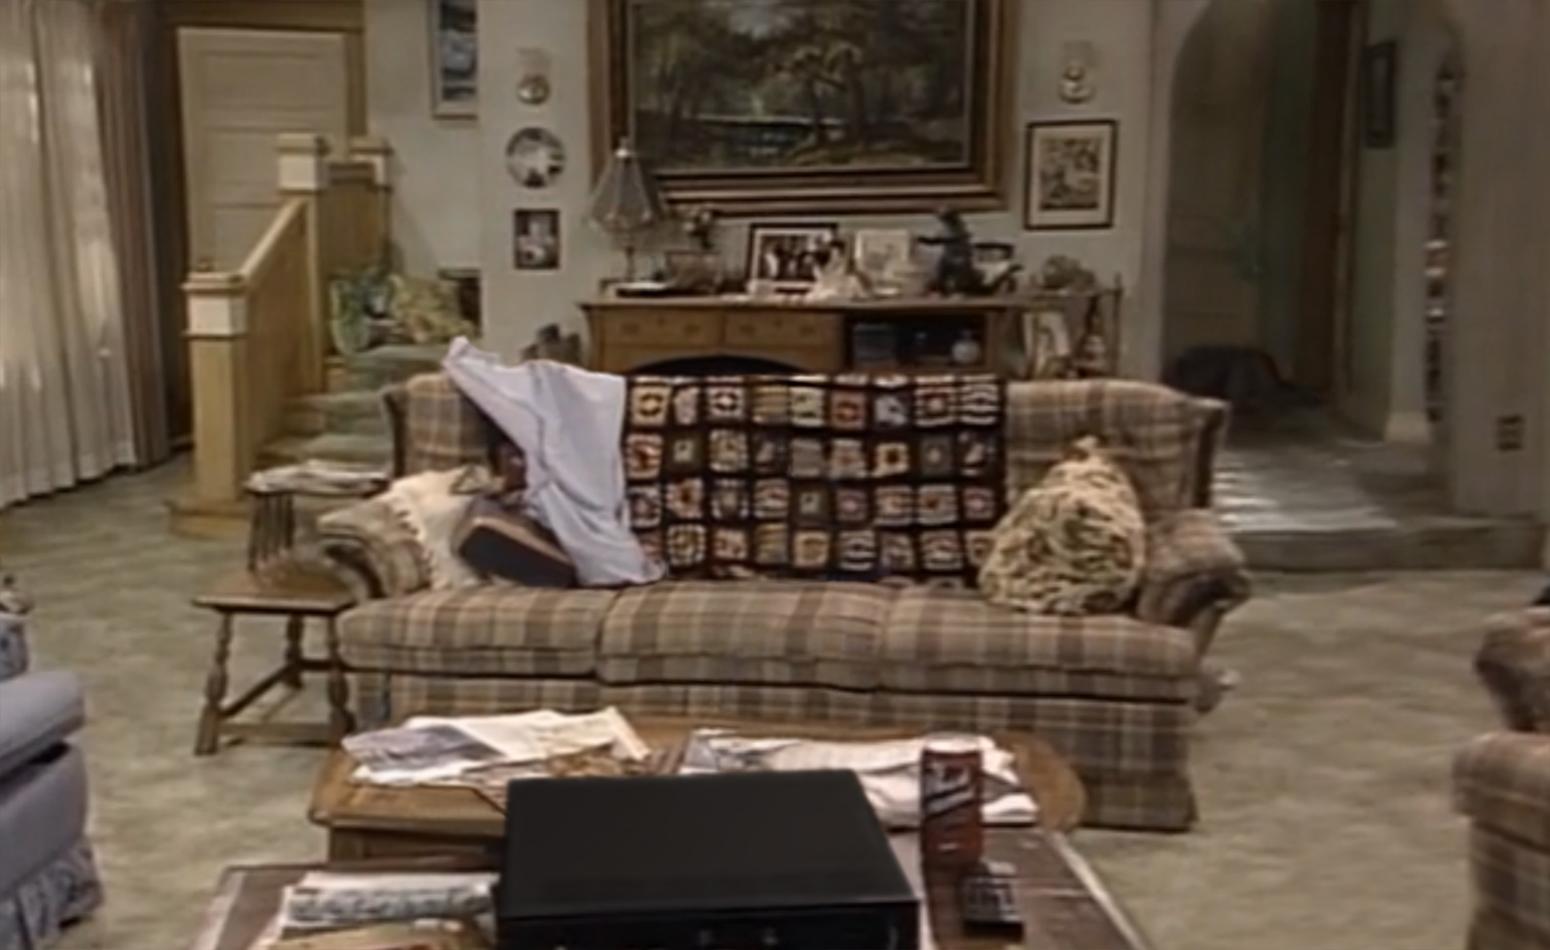 Sitcom Family Rooms